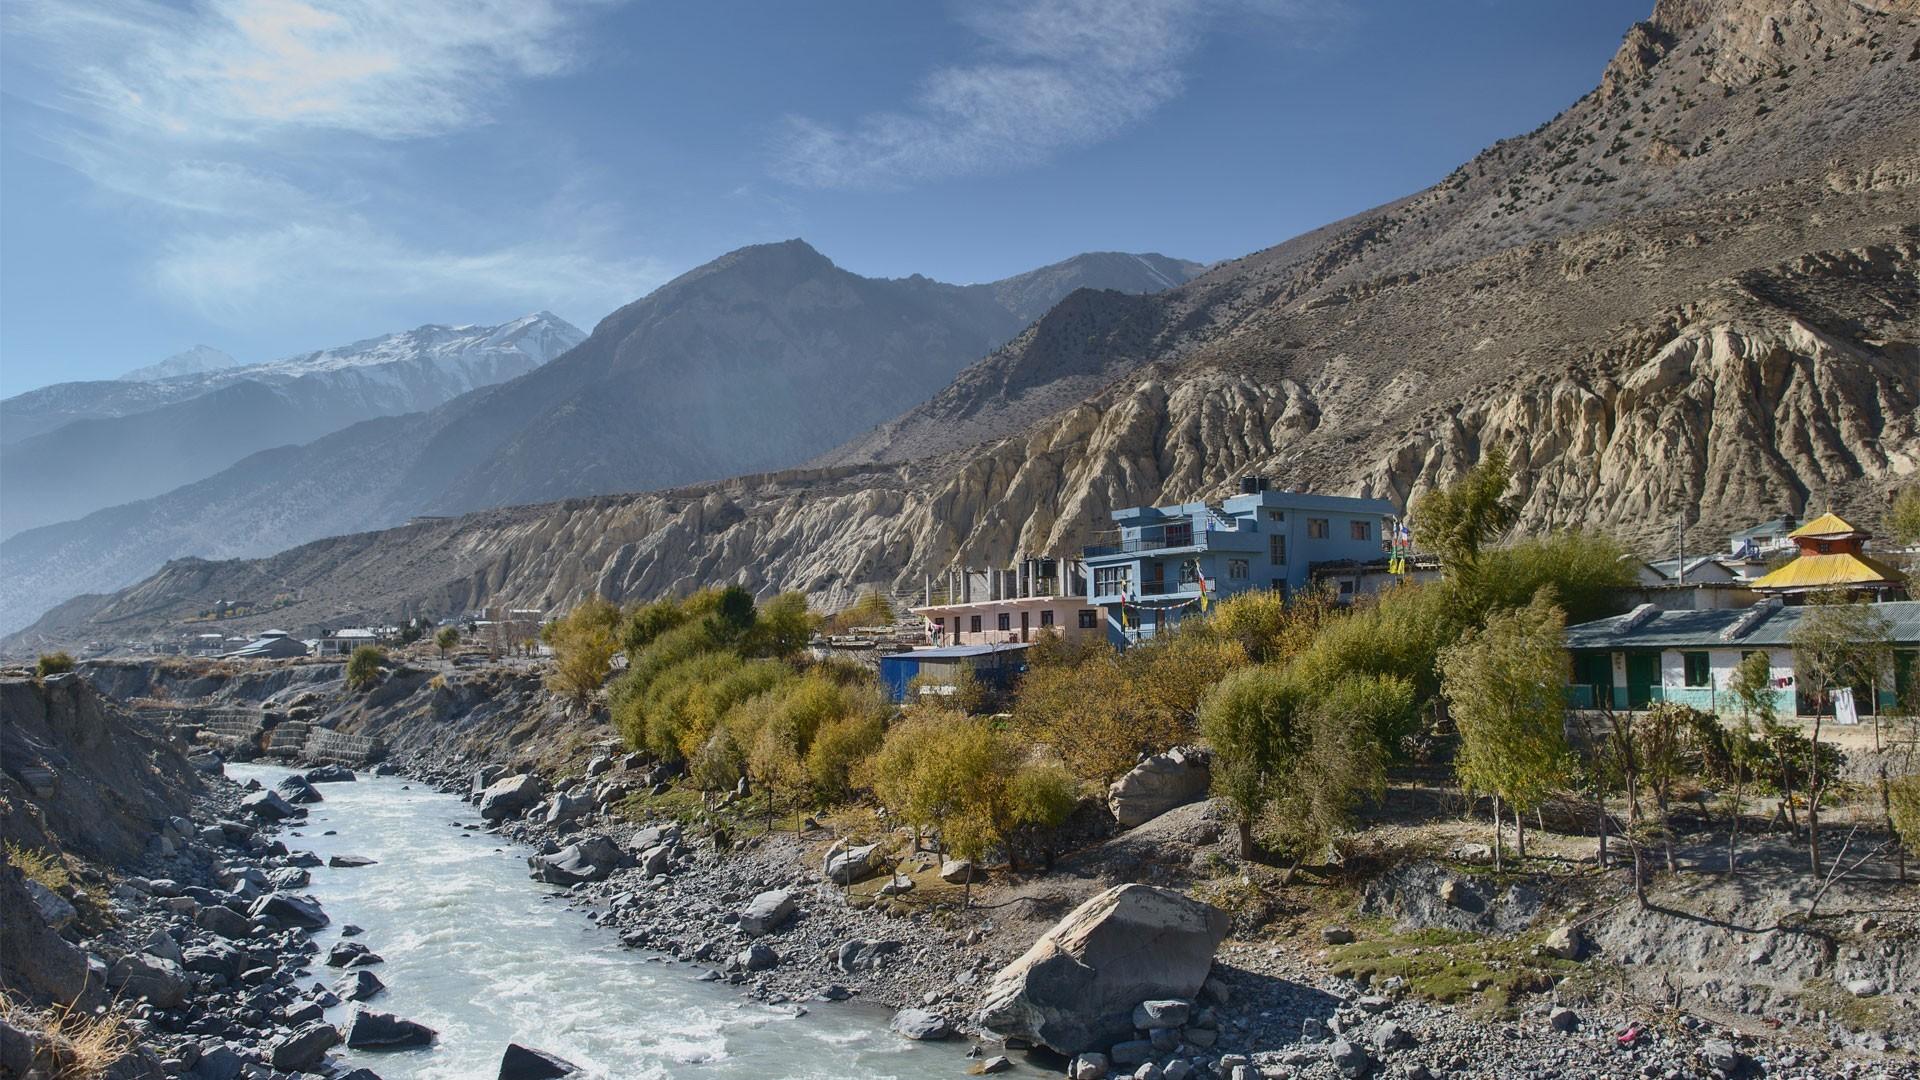 Annapurna Jomsom Muktinath trek